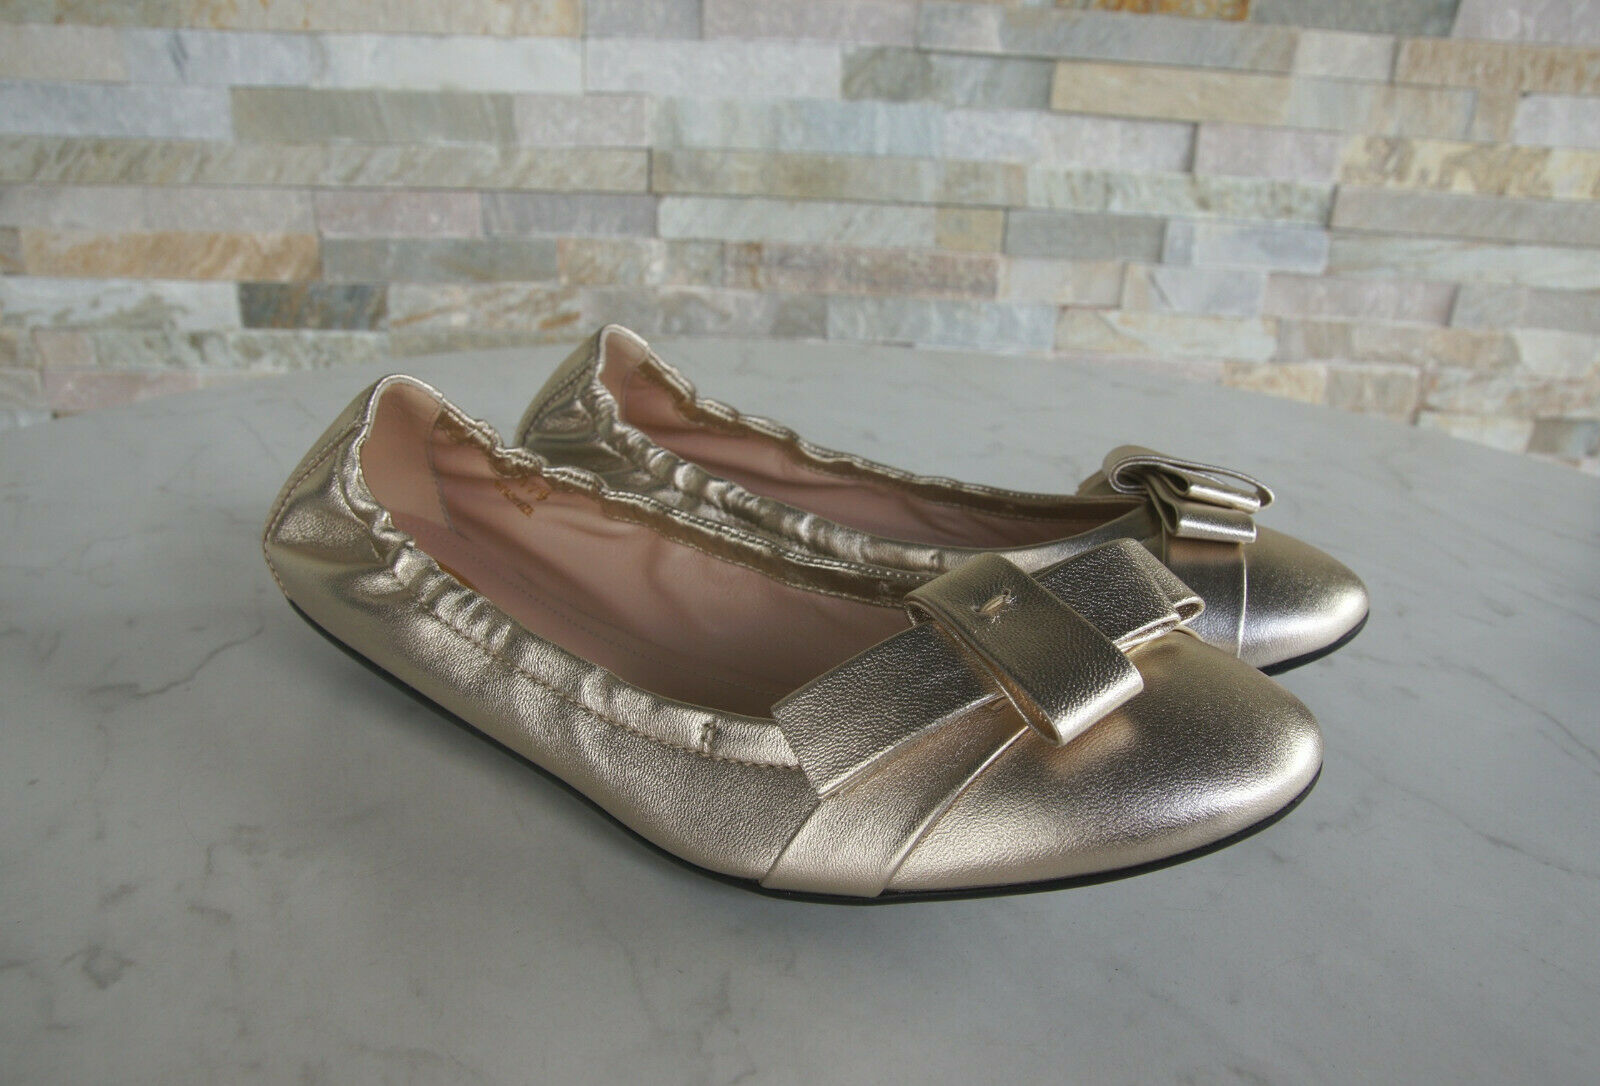 Tods Morte ´ S S S Gr 37,5 Ballerine Leggere shoes Basse gold Brillante Origin. 8a877a